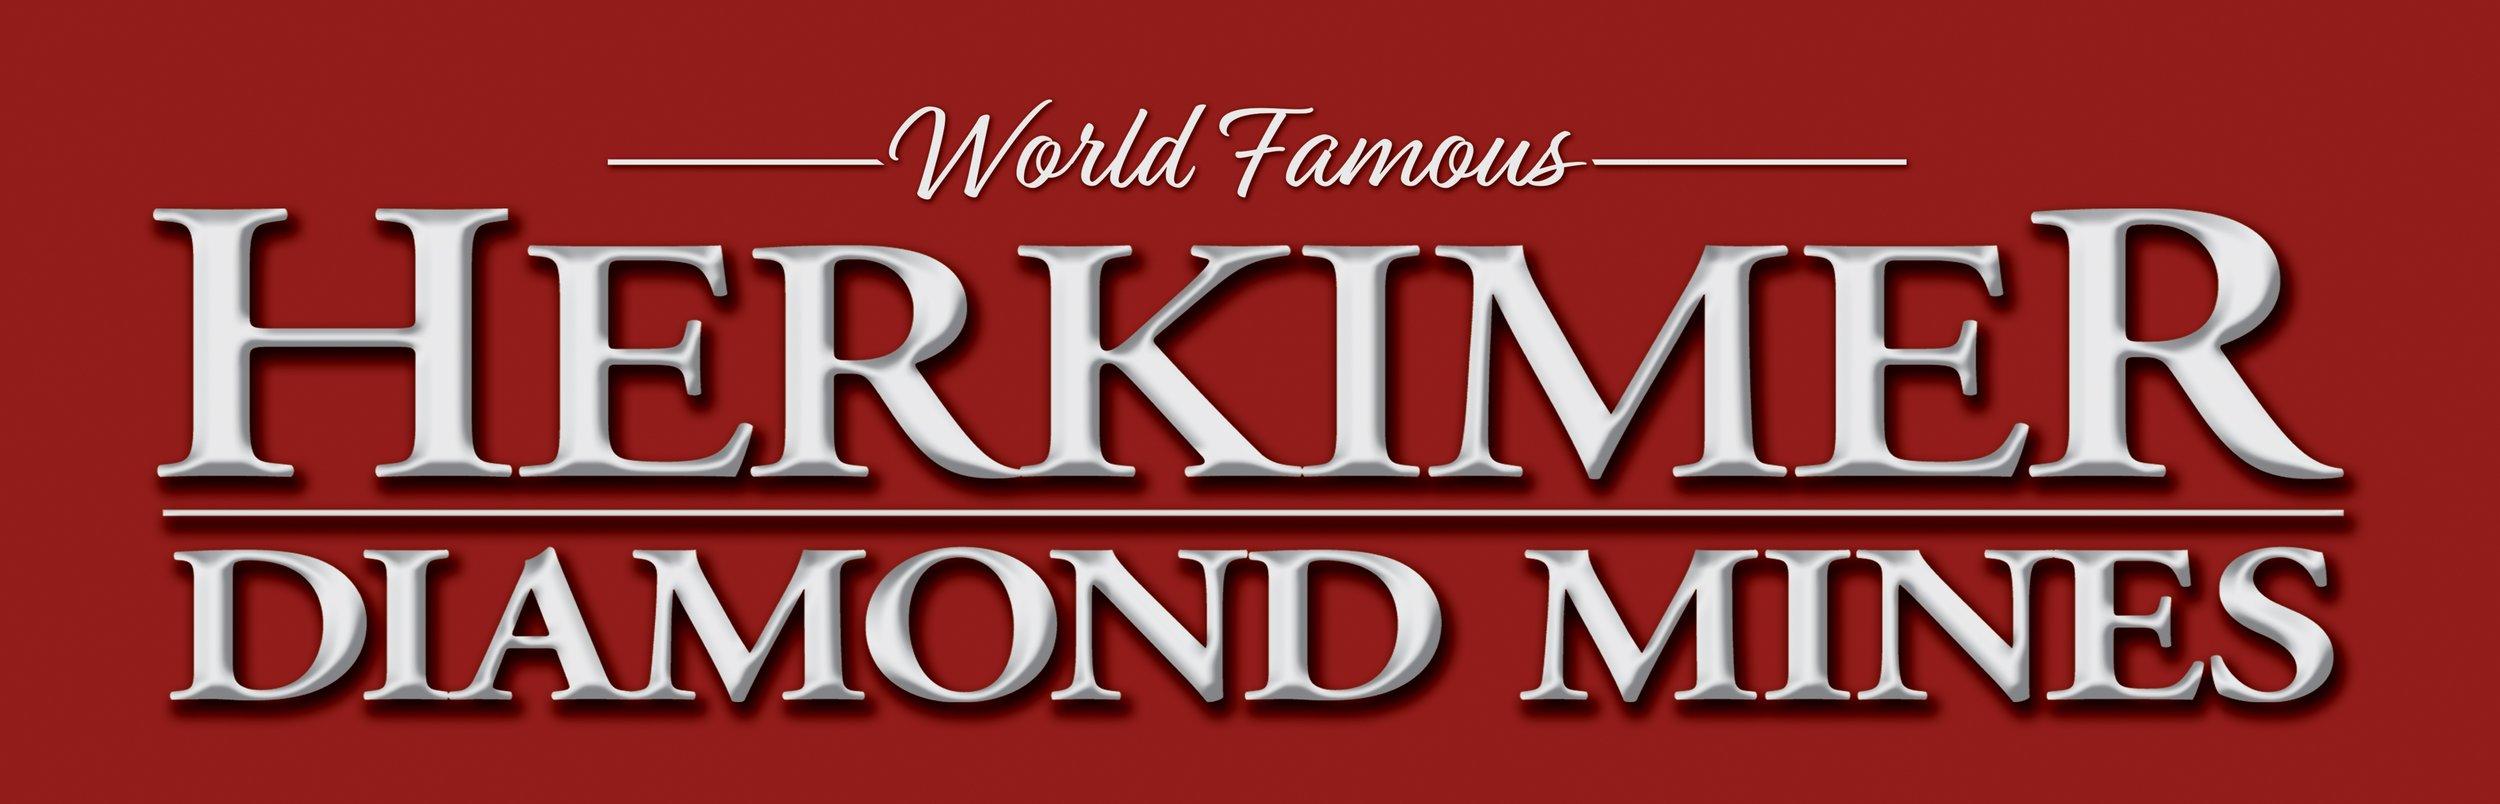 Herkimer Diamond Mines logo.jpg